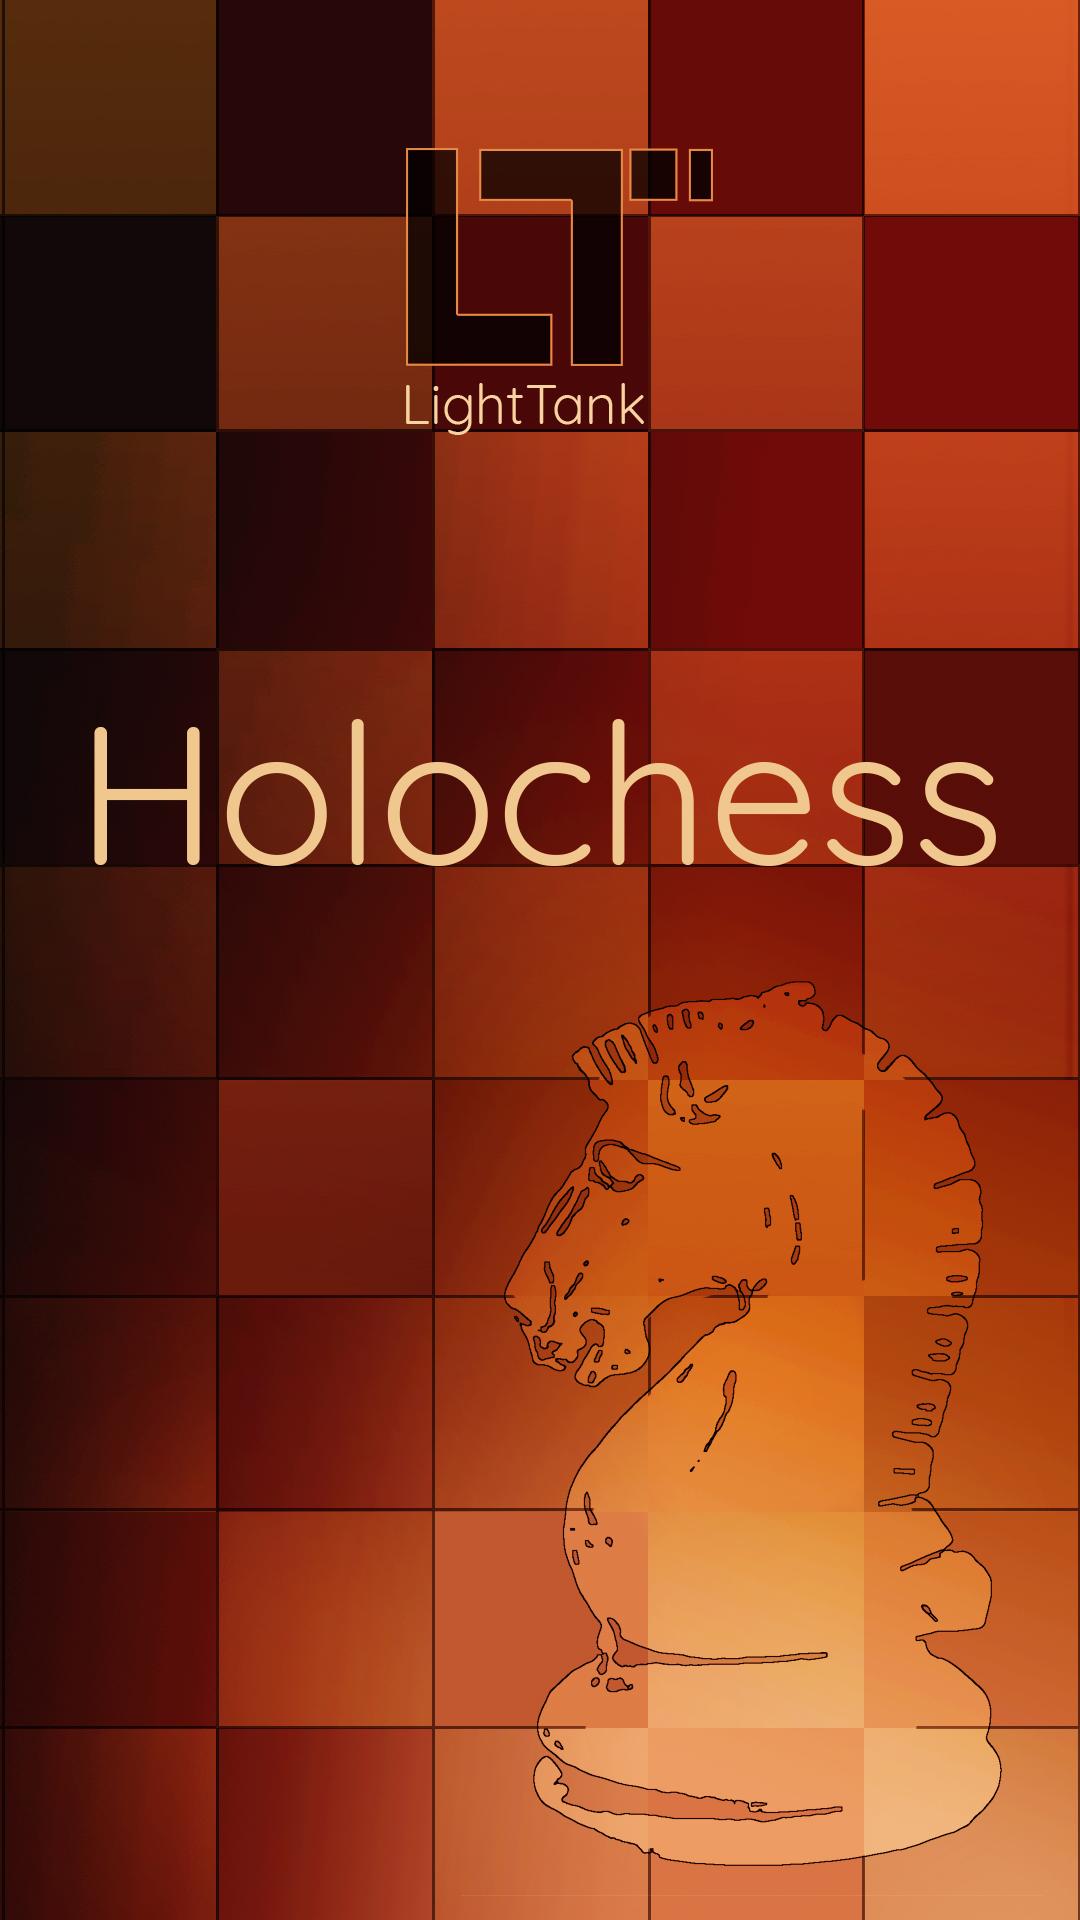 Holochess